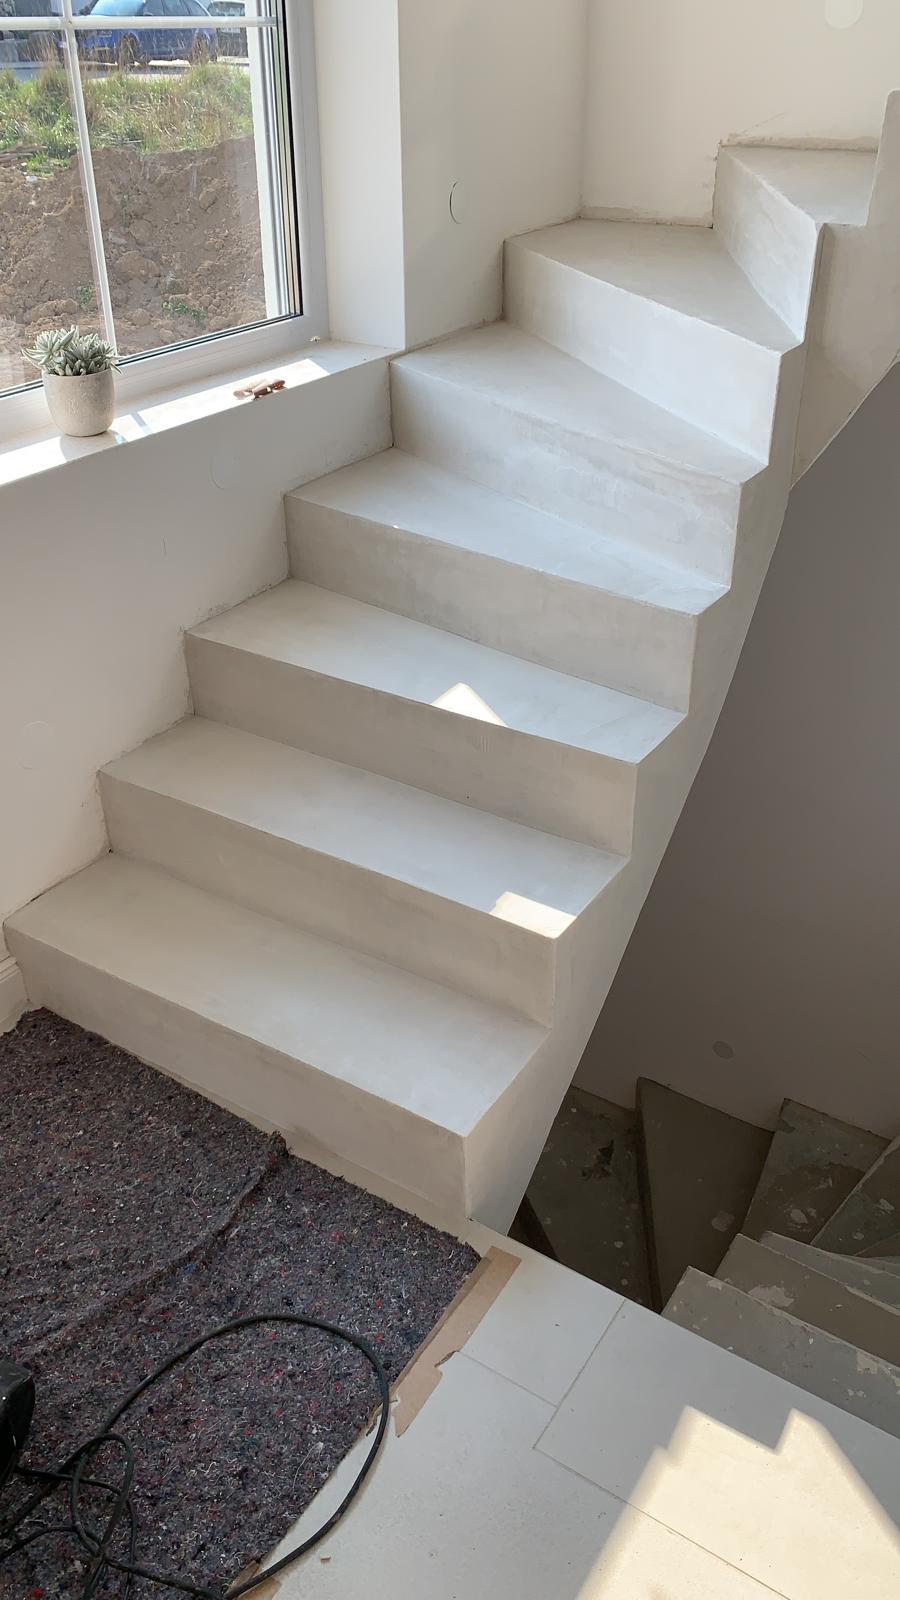 Beton Cire Unique - Baustellenbilder Treppenbeschichtung - DIY - Sichbetontreppe - Betonlook